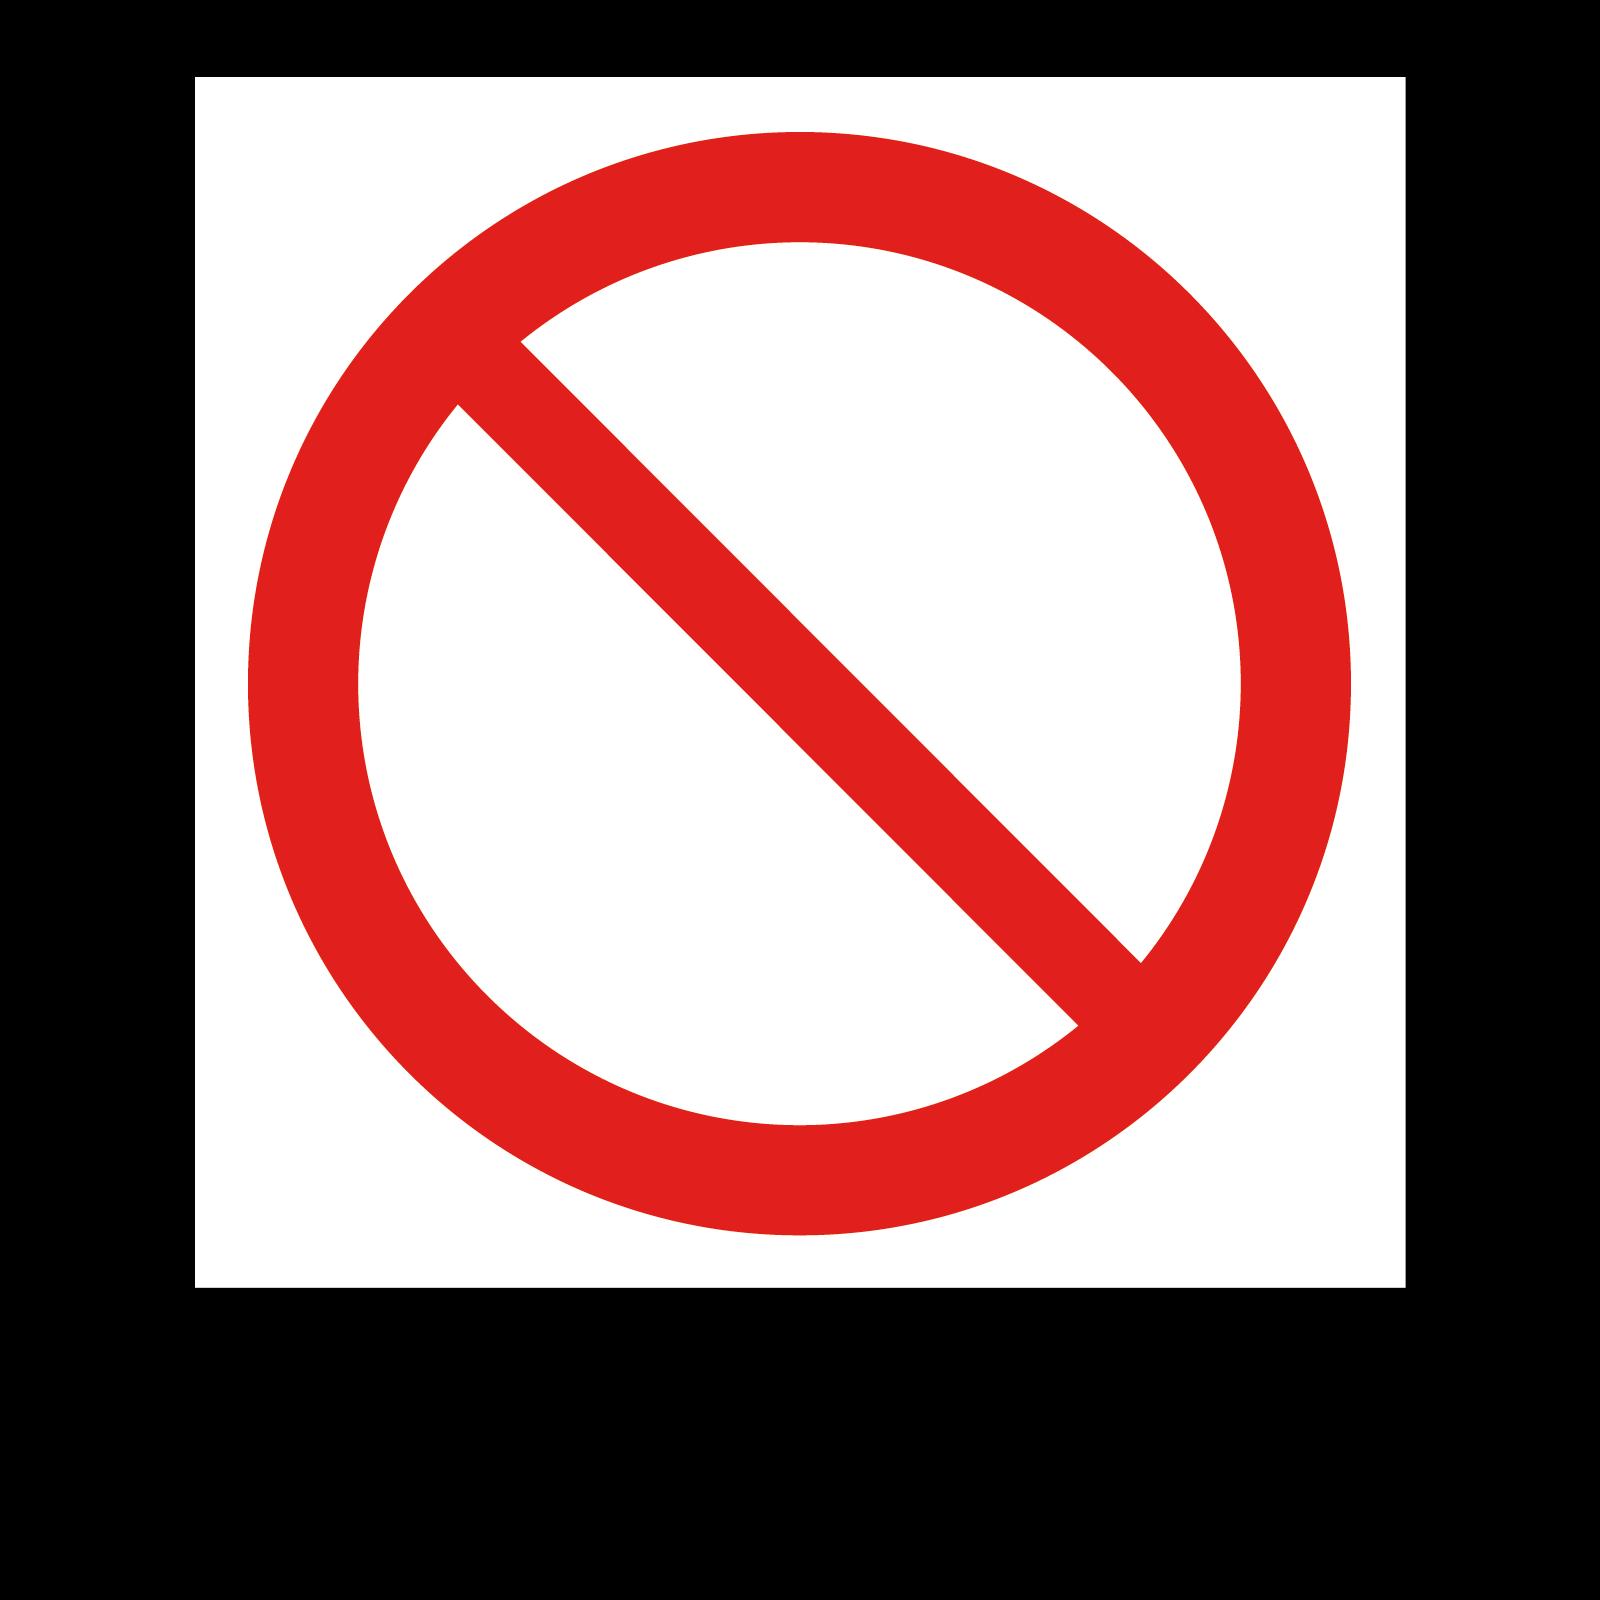 Prohibition Safety Symbol Sign